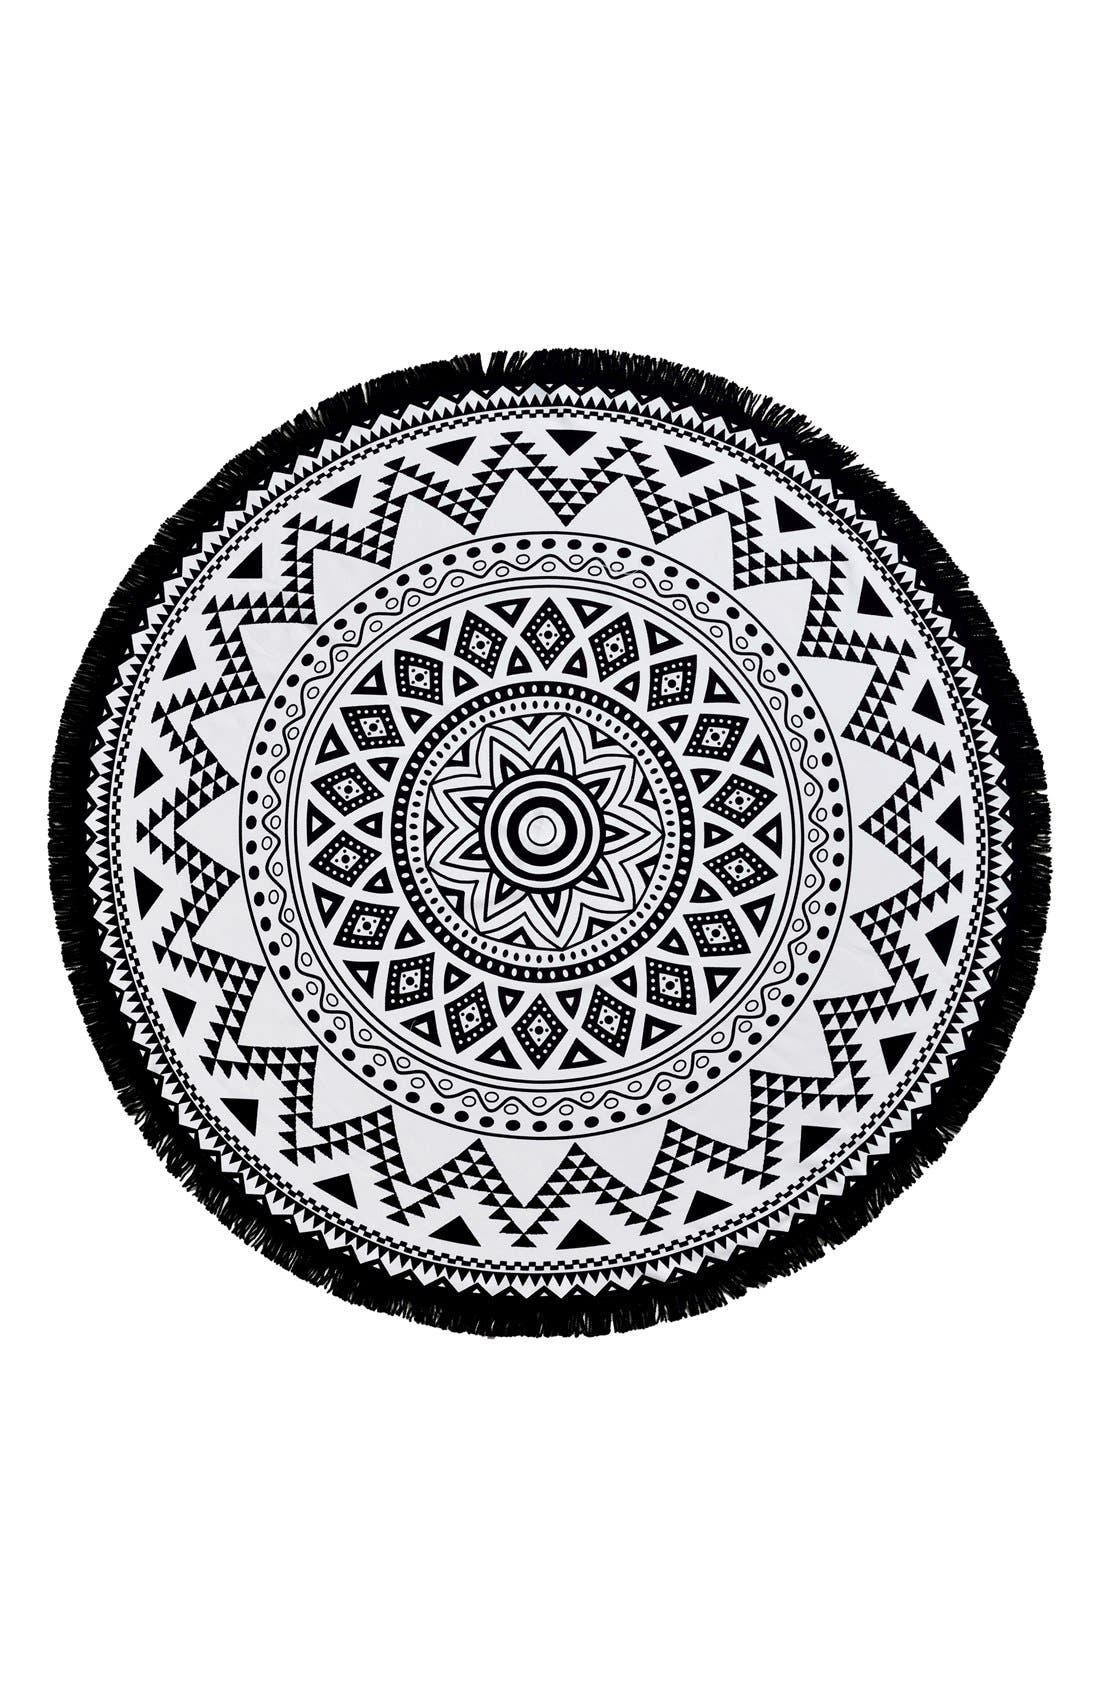 'Kilim' Turkish Pestemal Round Beach Towel,                             Main thumbnail 1, color,                             BLACK/ WHITE